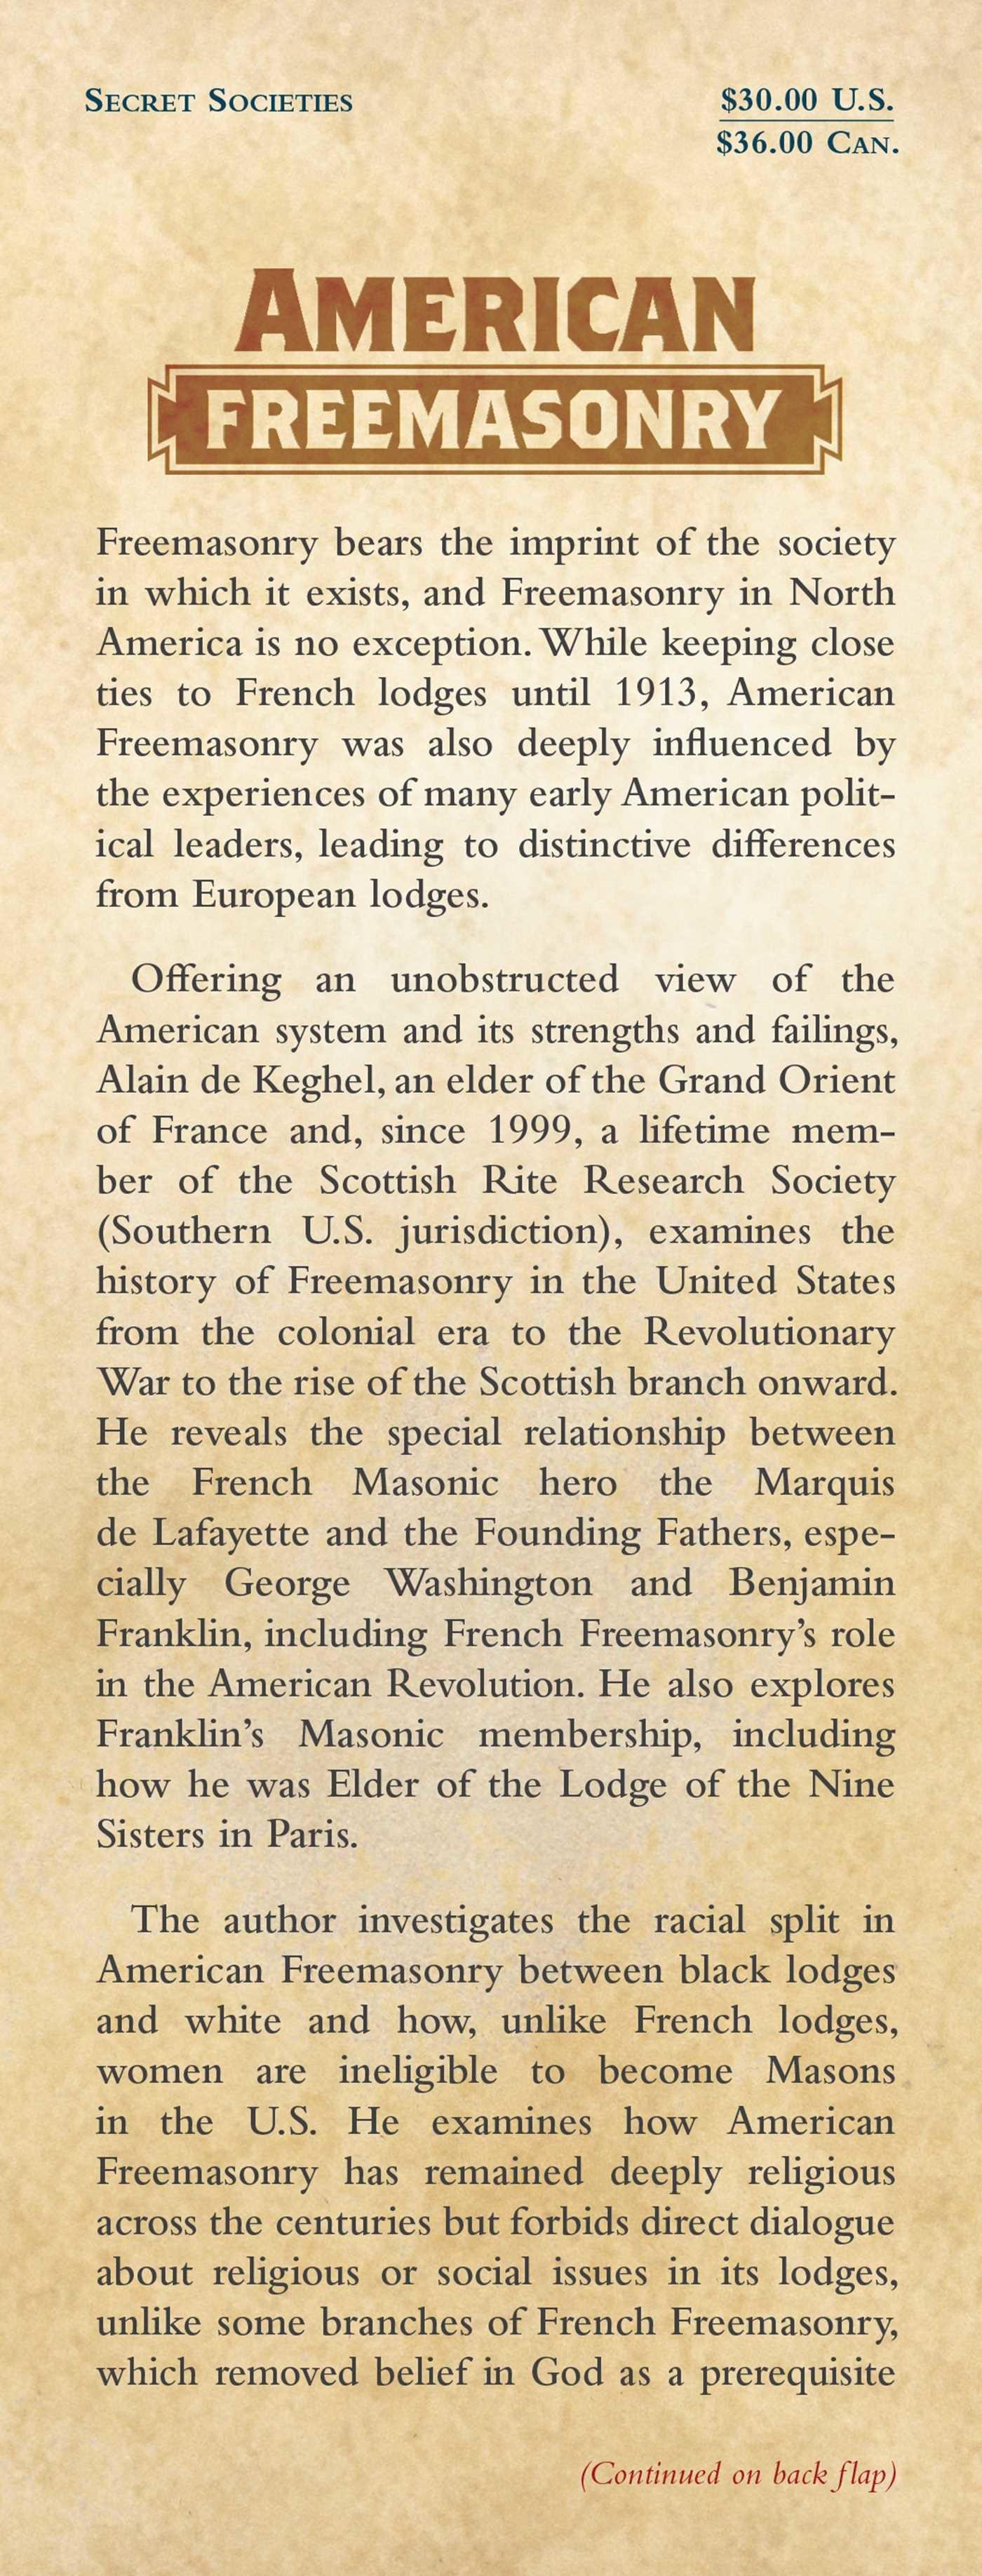 American freemasonry 9781620556054.in01